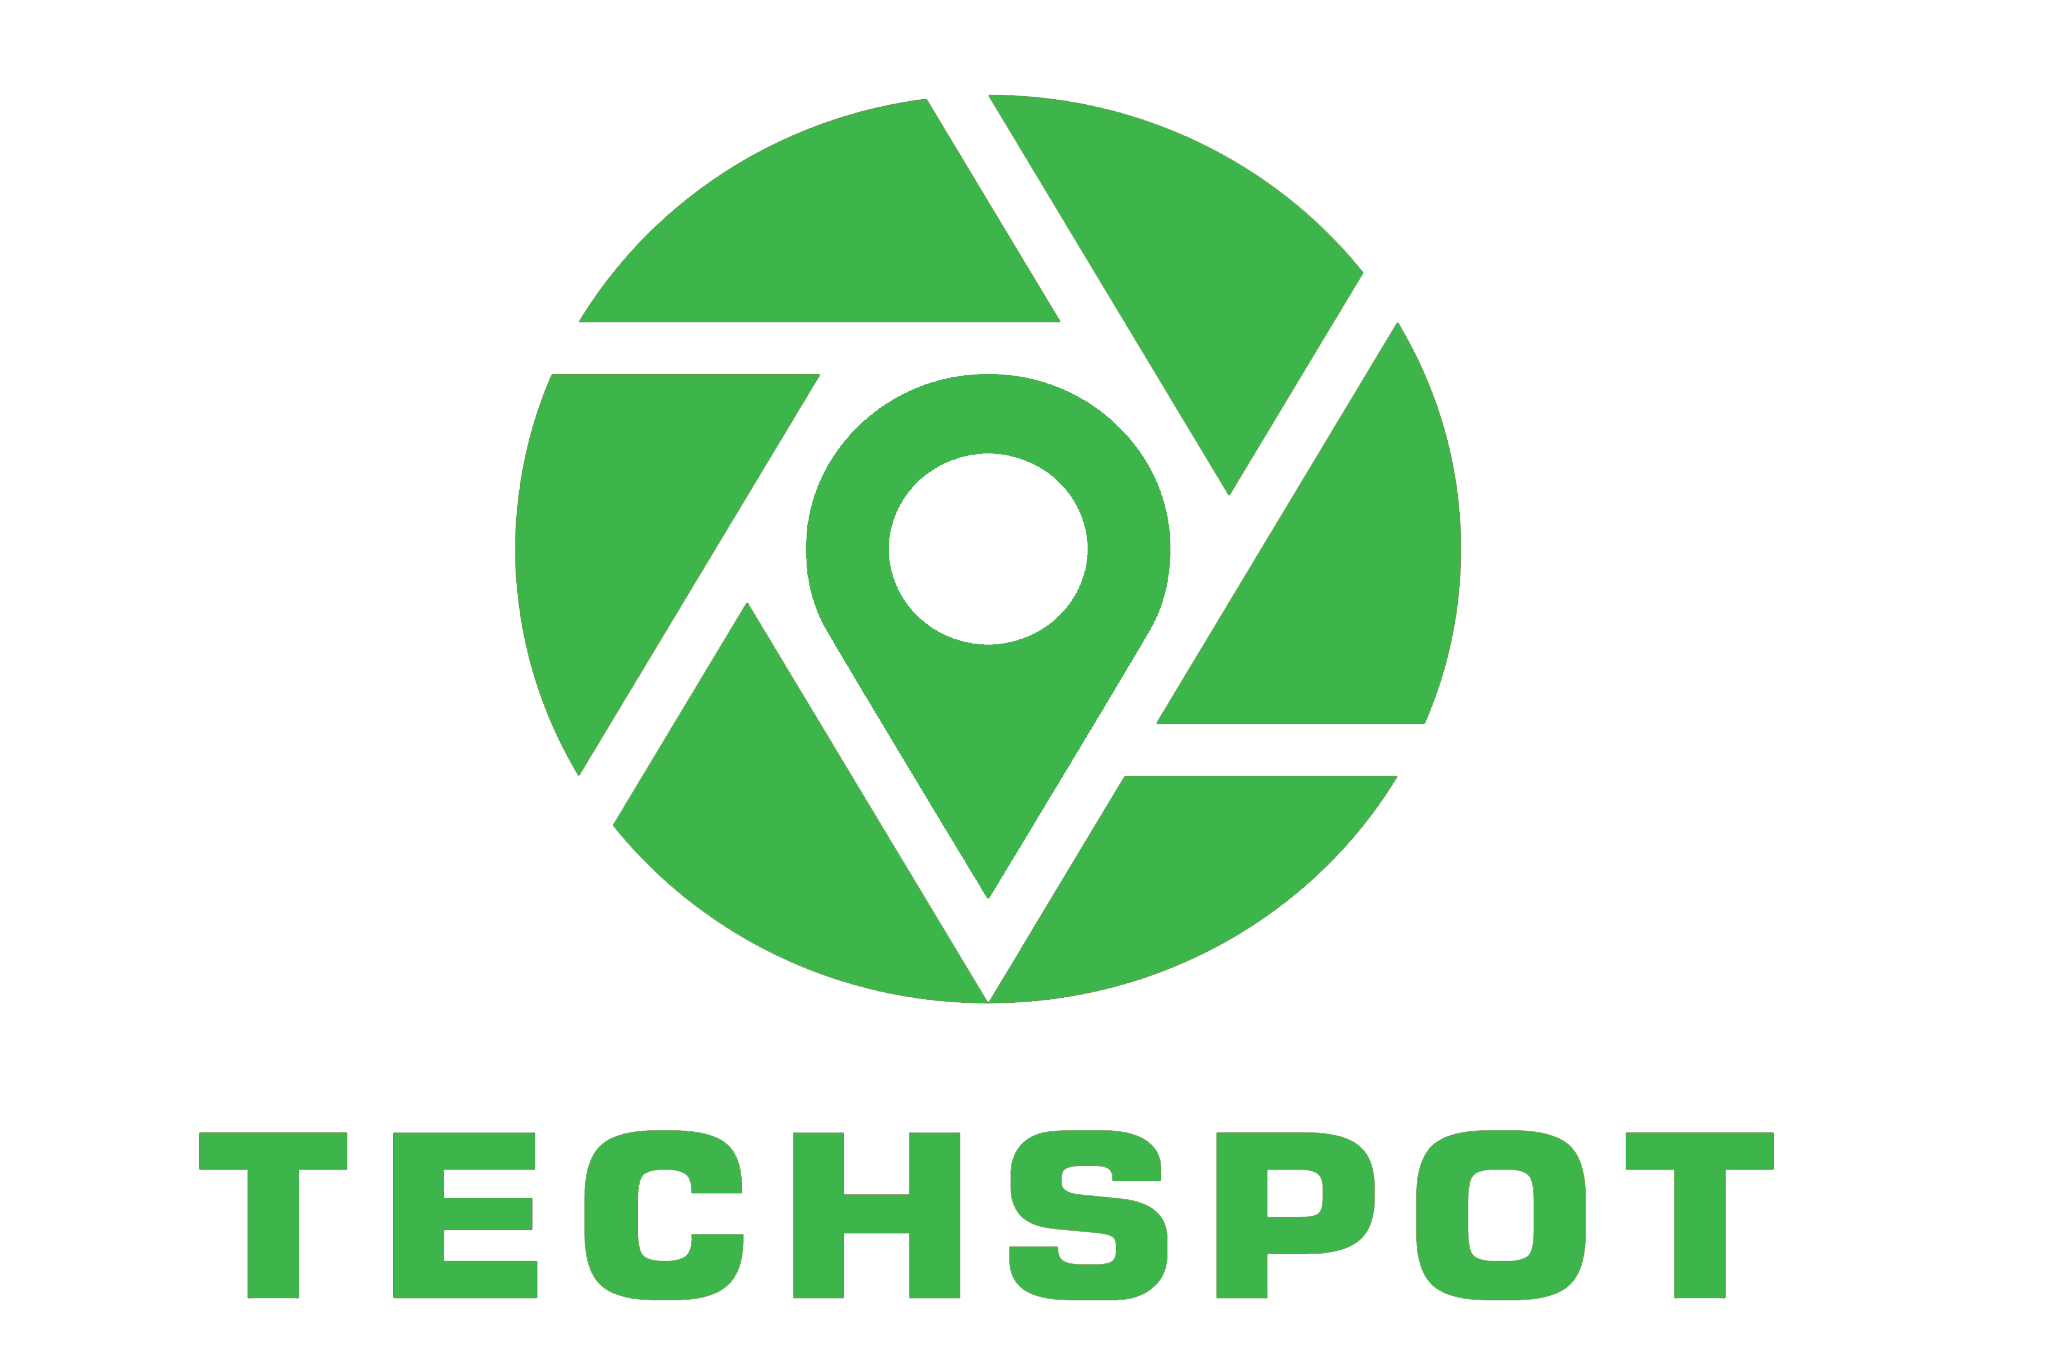 TechspotVn